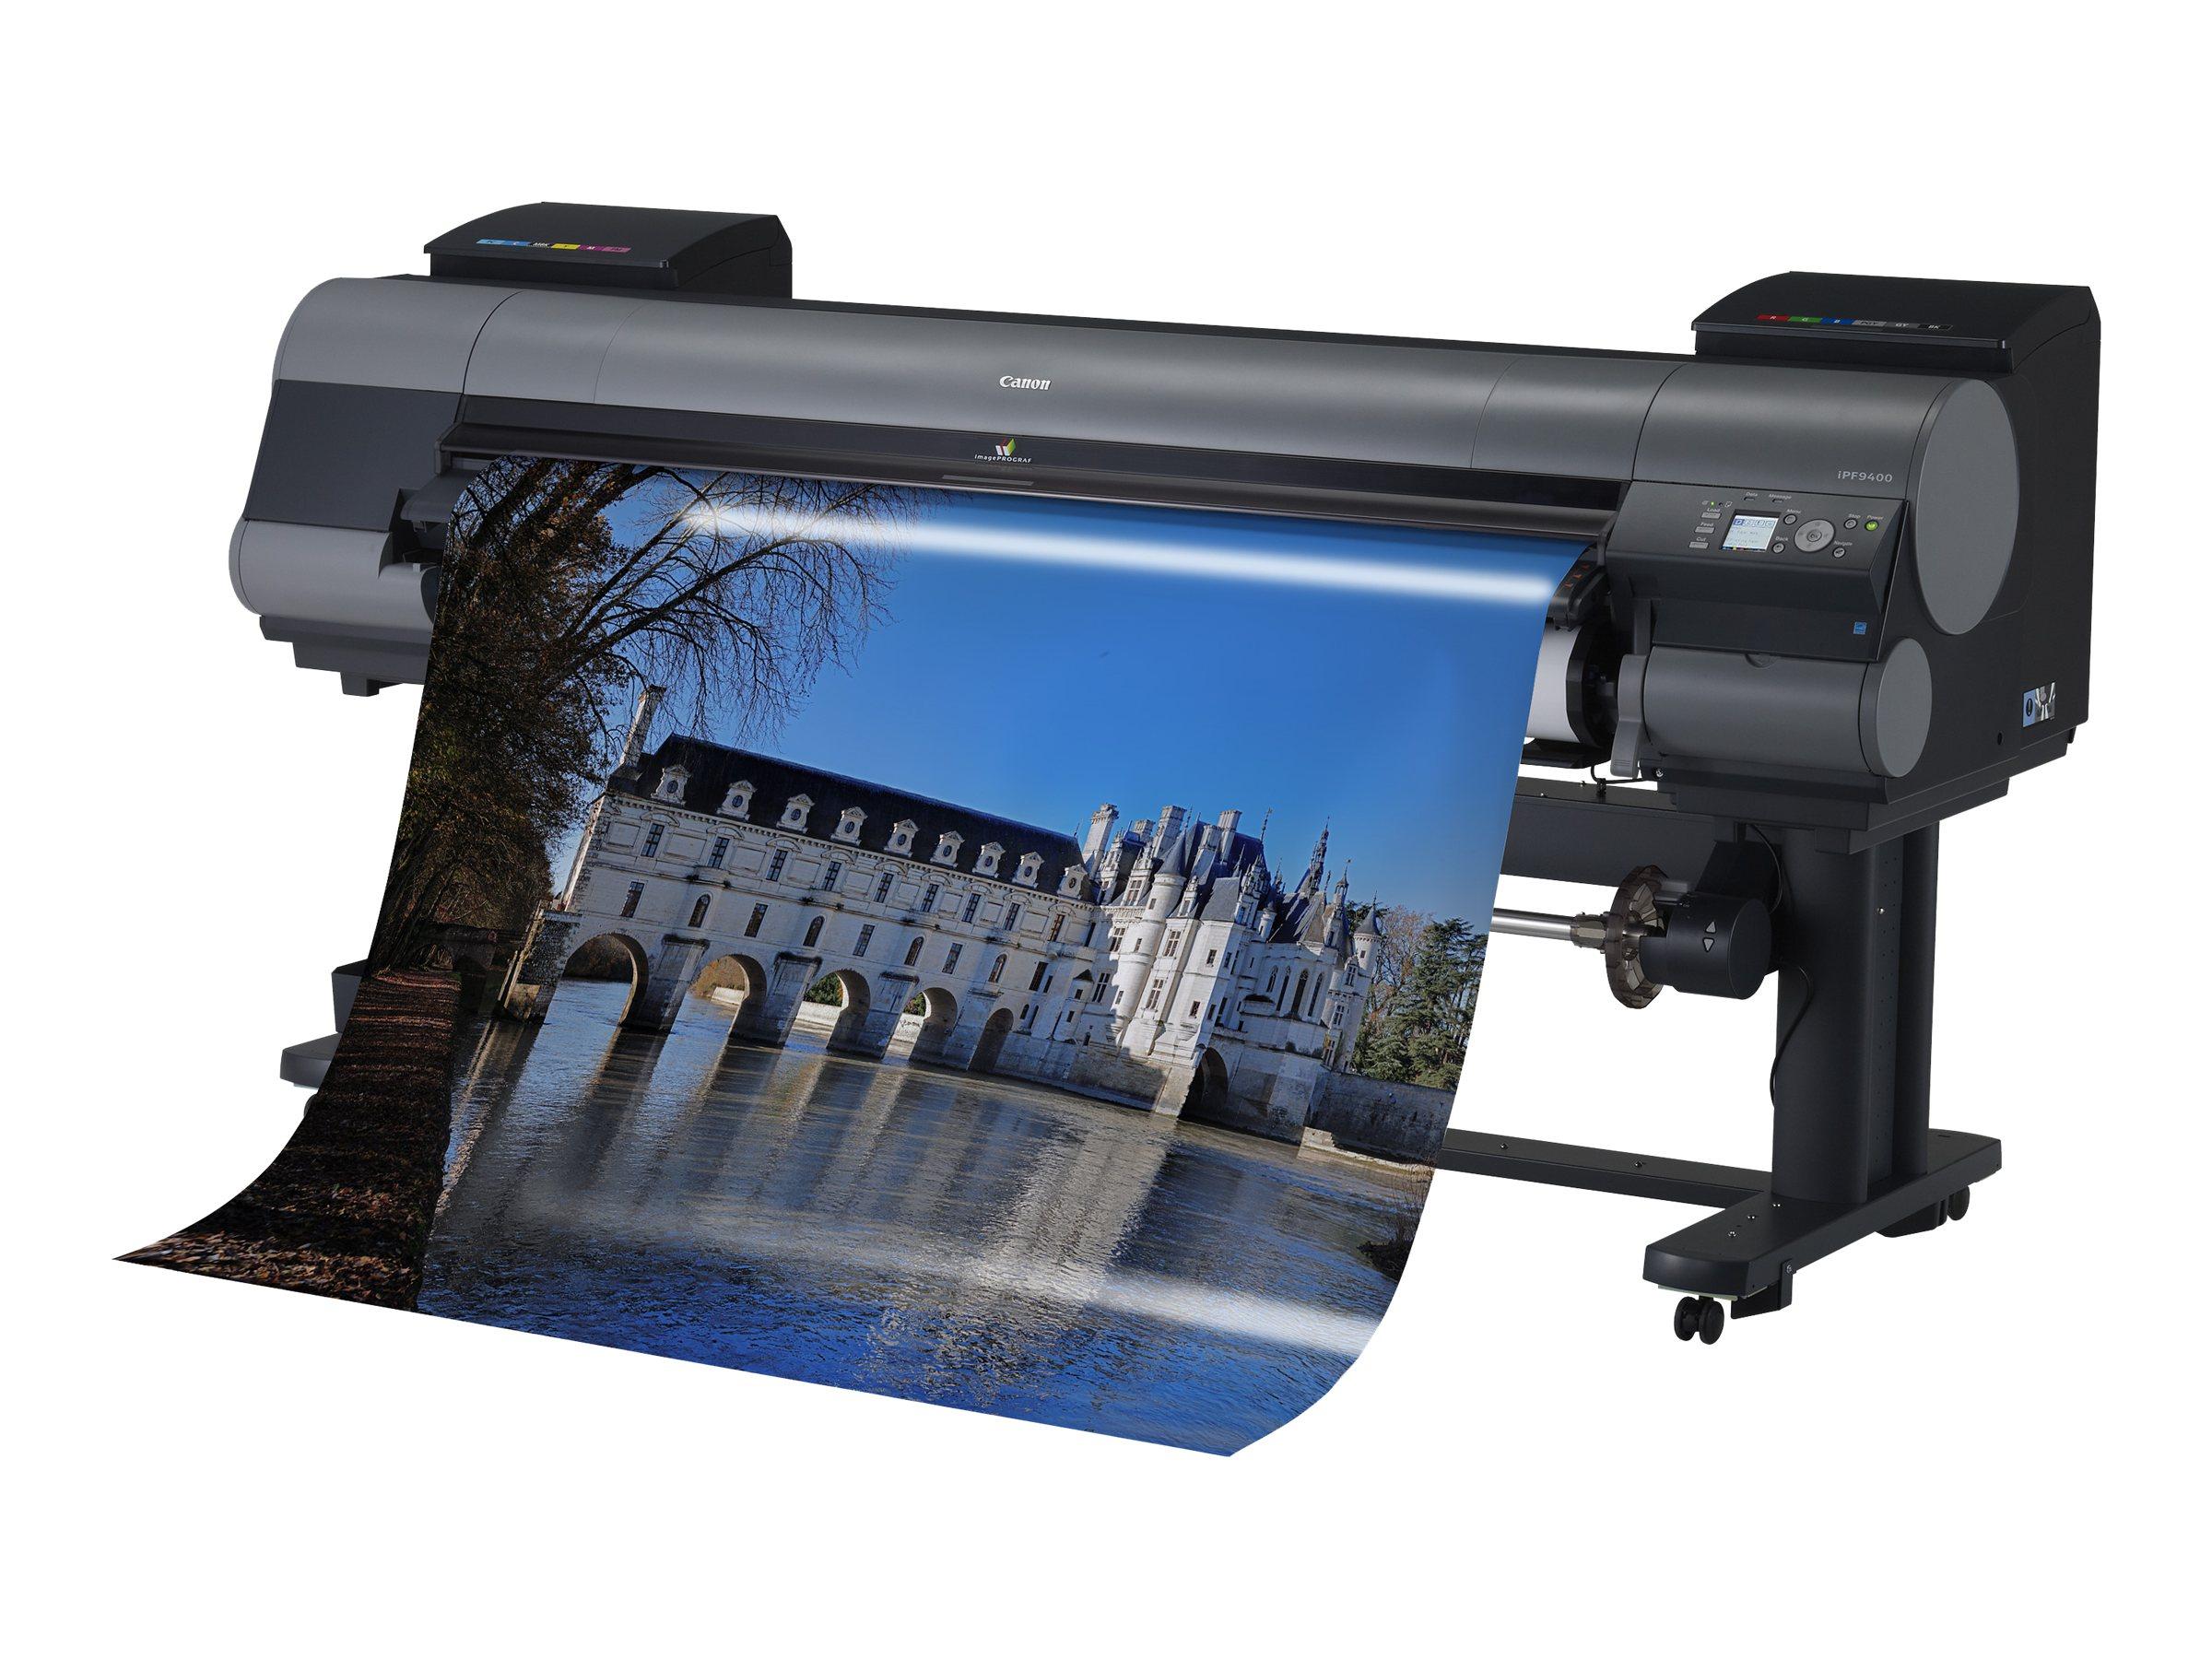 Canon imagePROGRAF iPF9400 Graphic Arts & Photo Printer